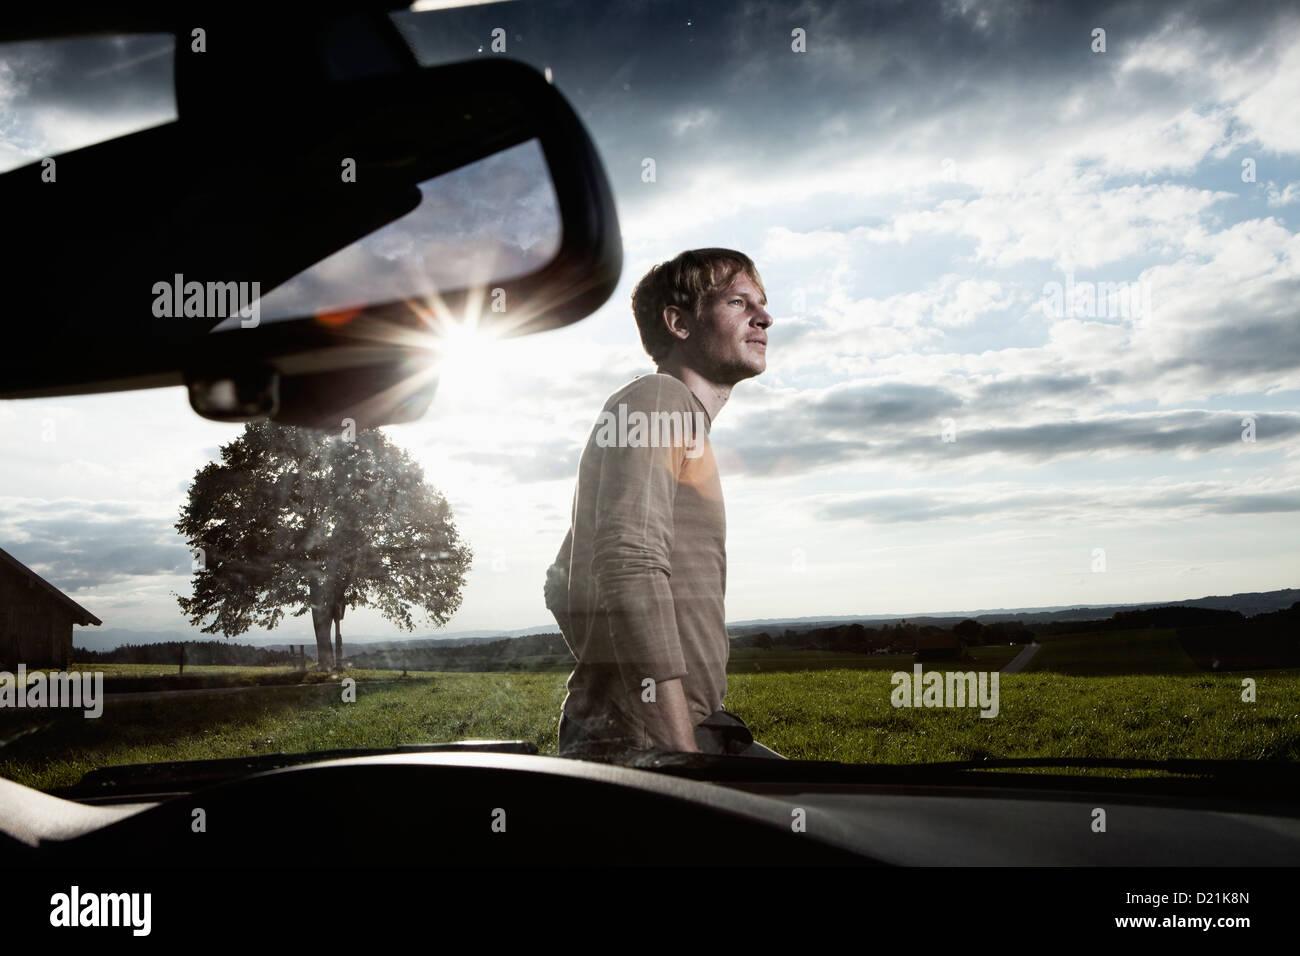 Allemagne, Bavière, Mid adult man standing en voiture Photo Stock